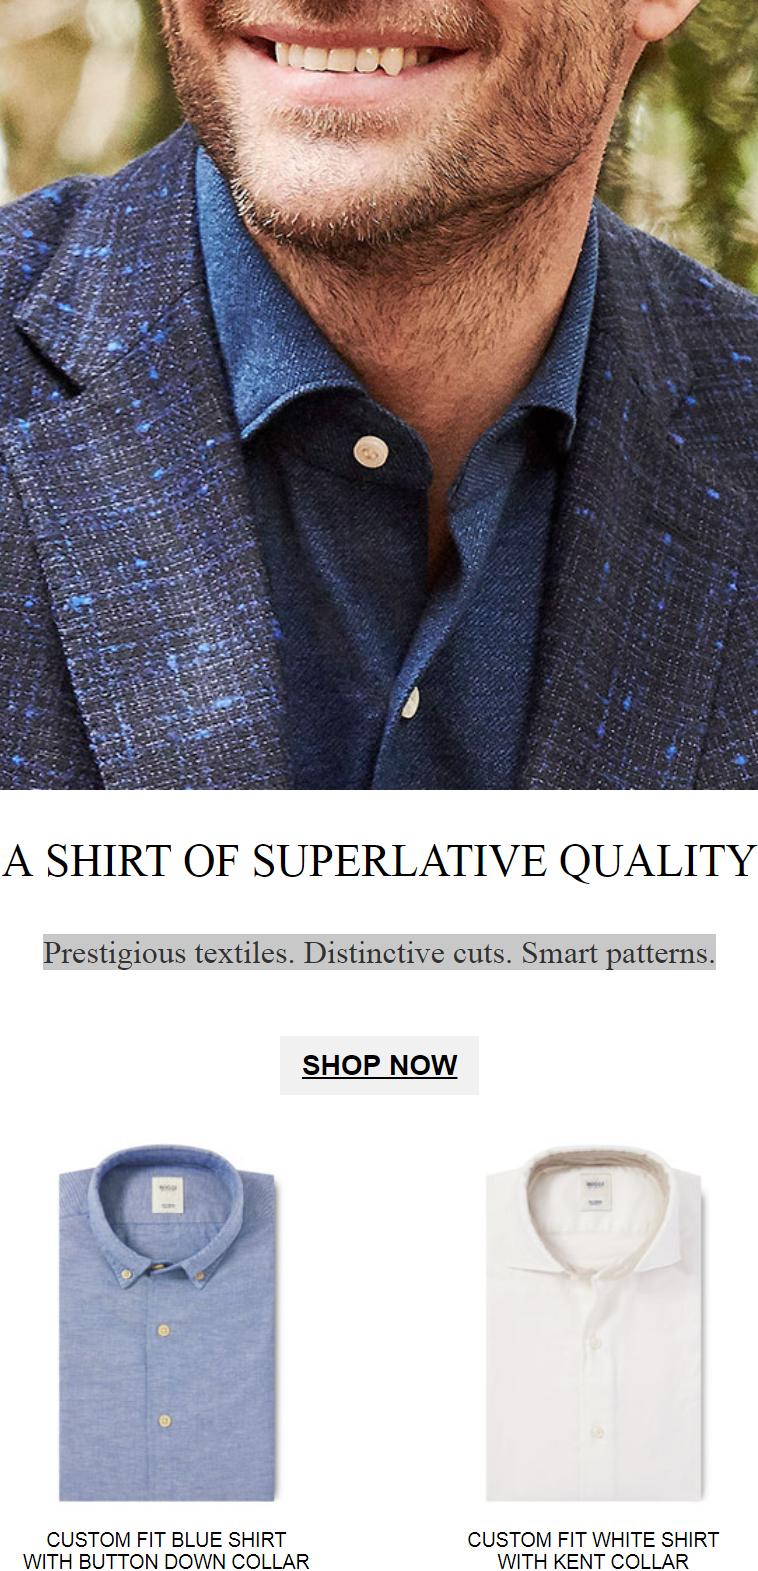 Prestigious textiles. Distinctive cuts. Smart patterns.